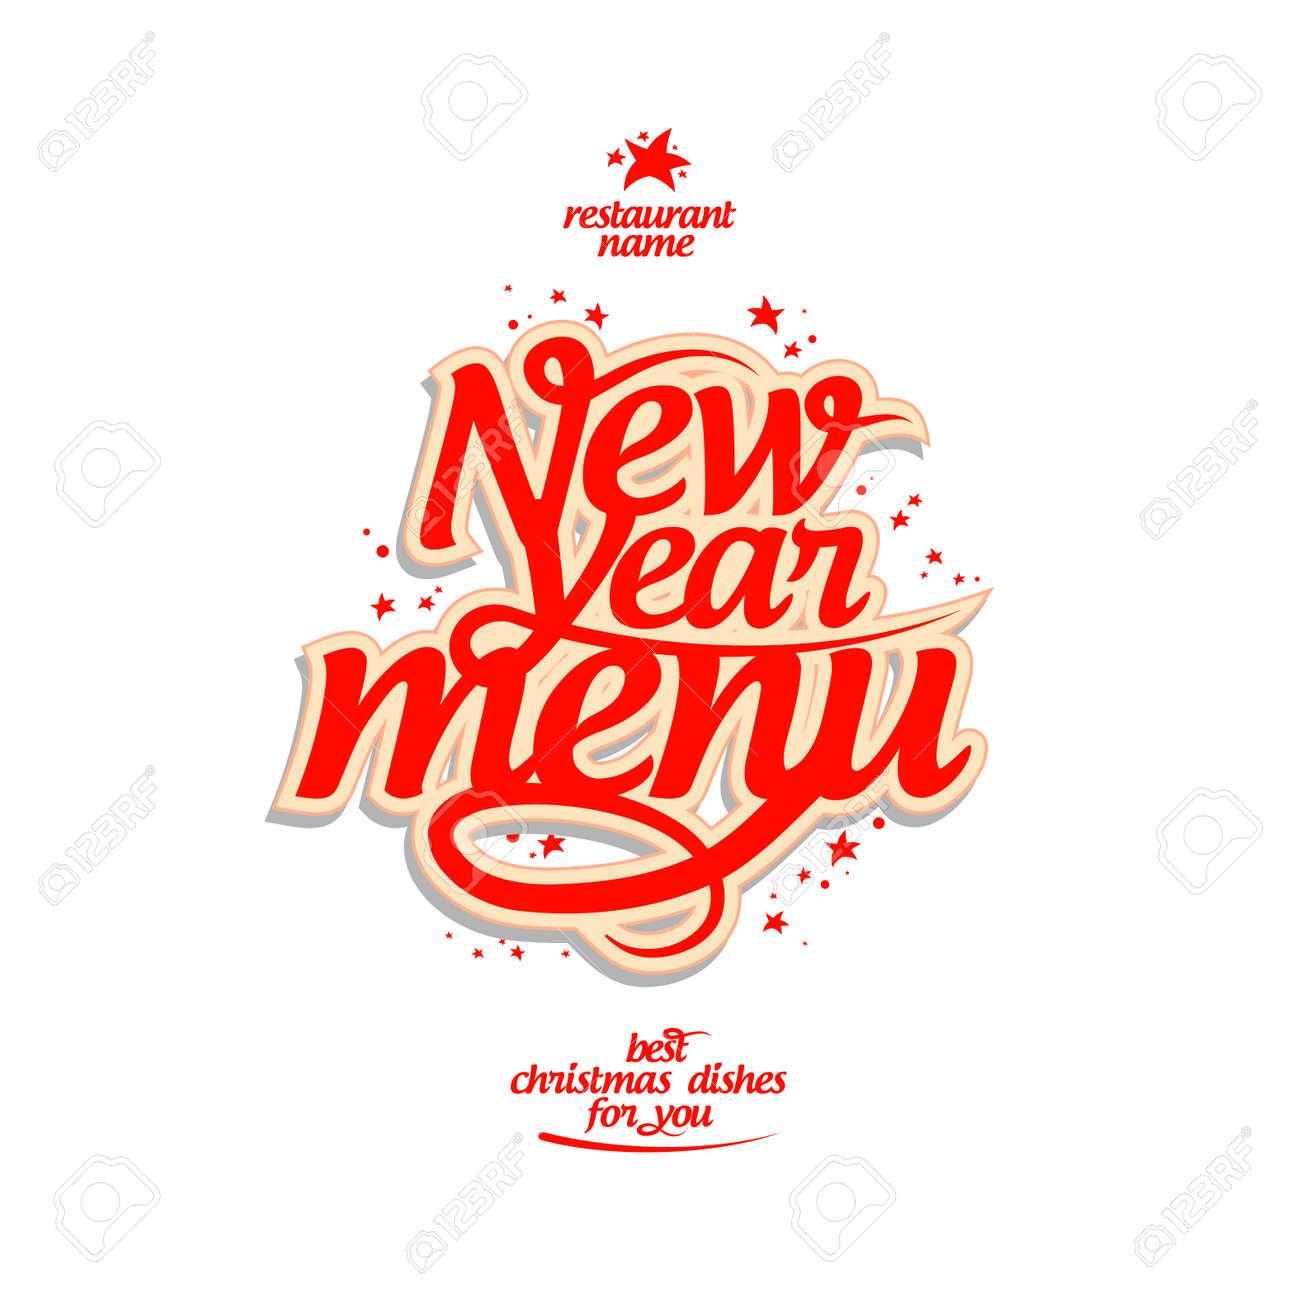 new year menu card design template stock vector 23992070